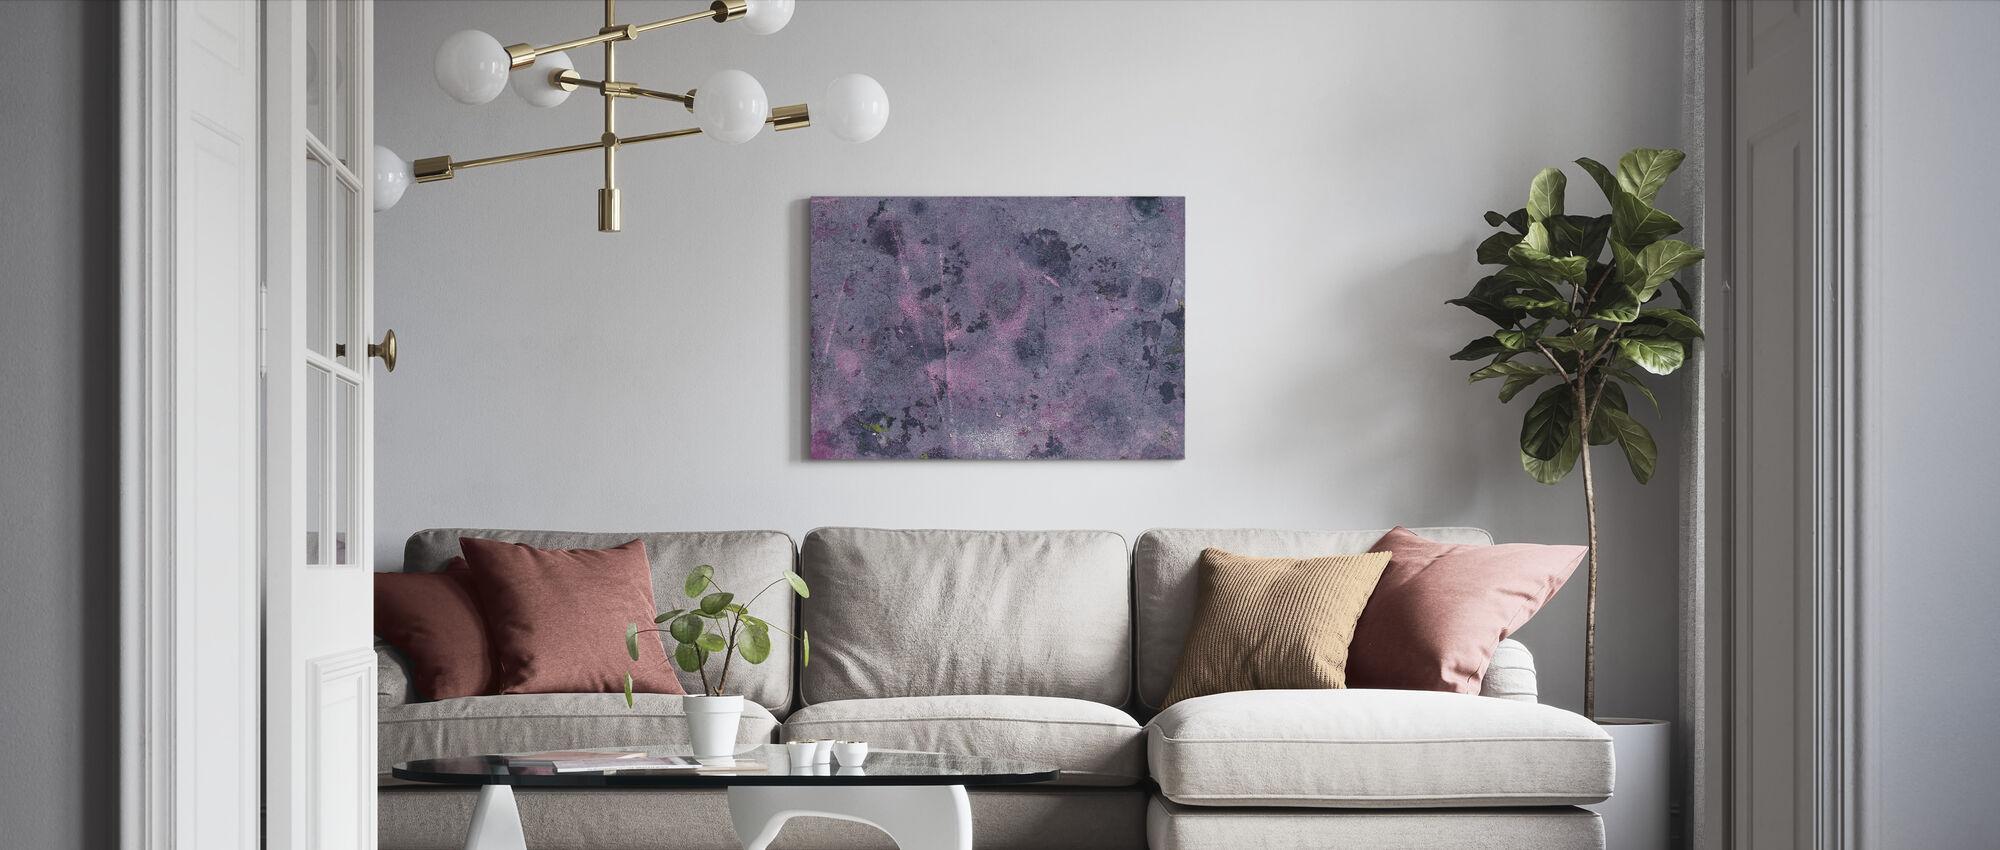 Torn Graffiti Wall - Canvas print - Living Room